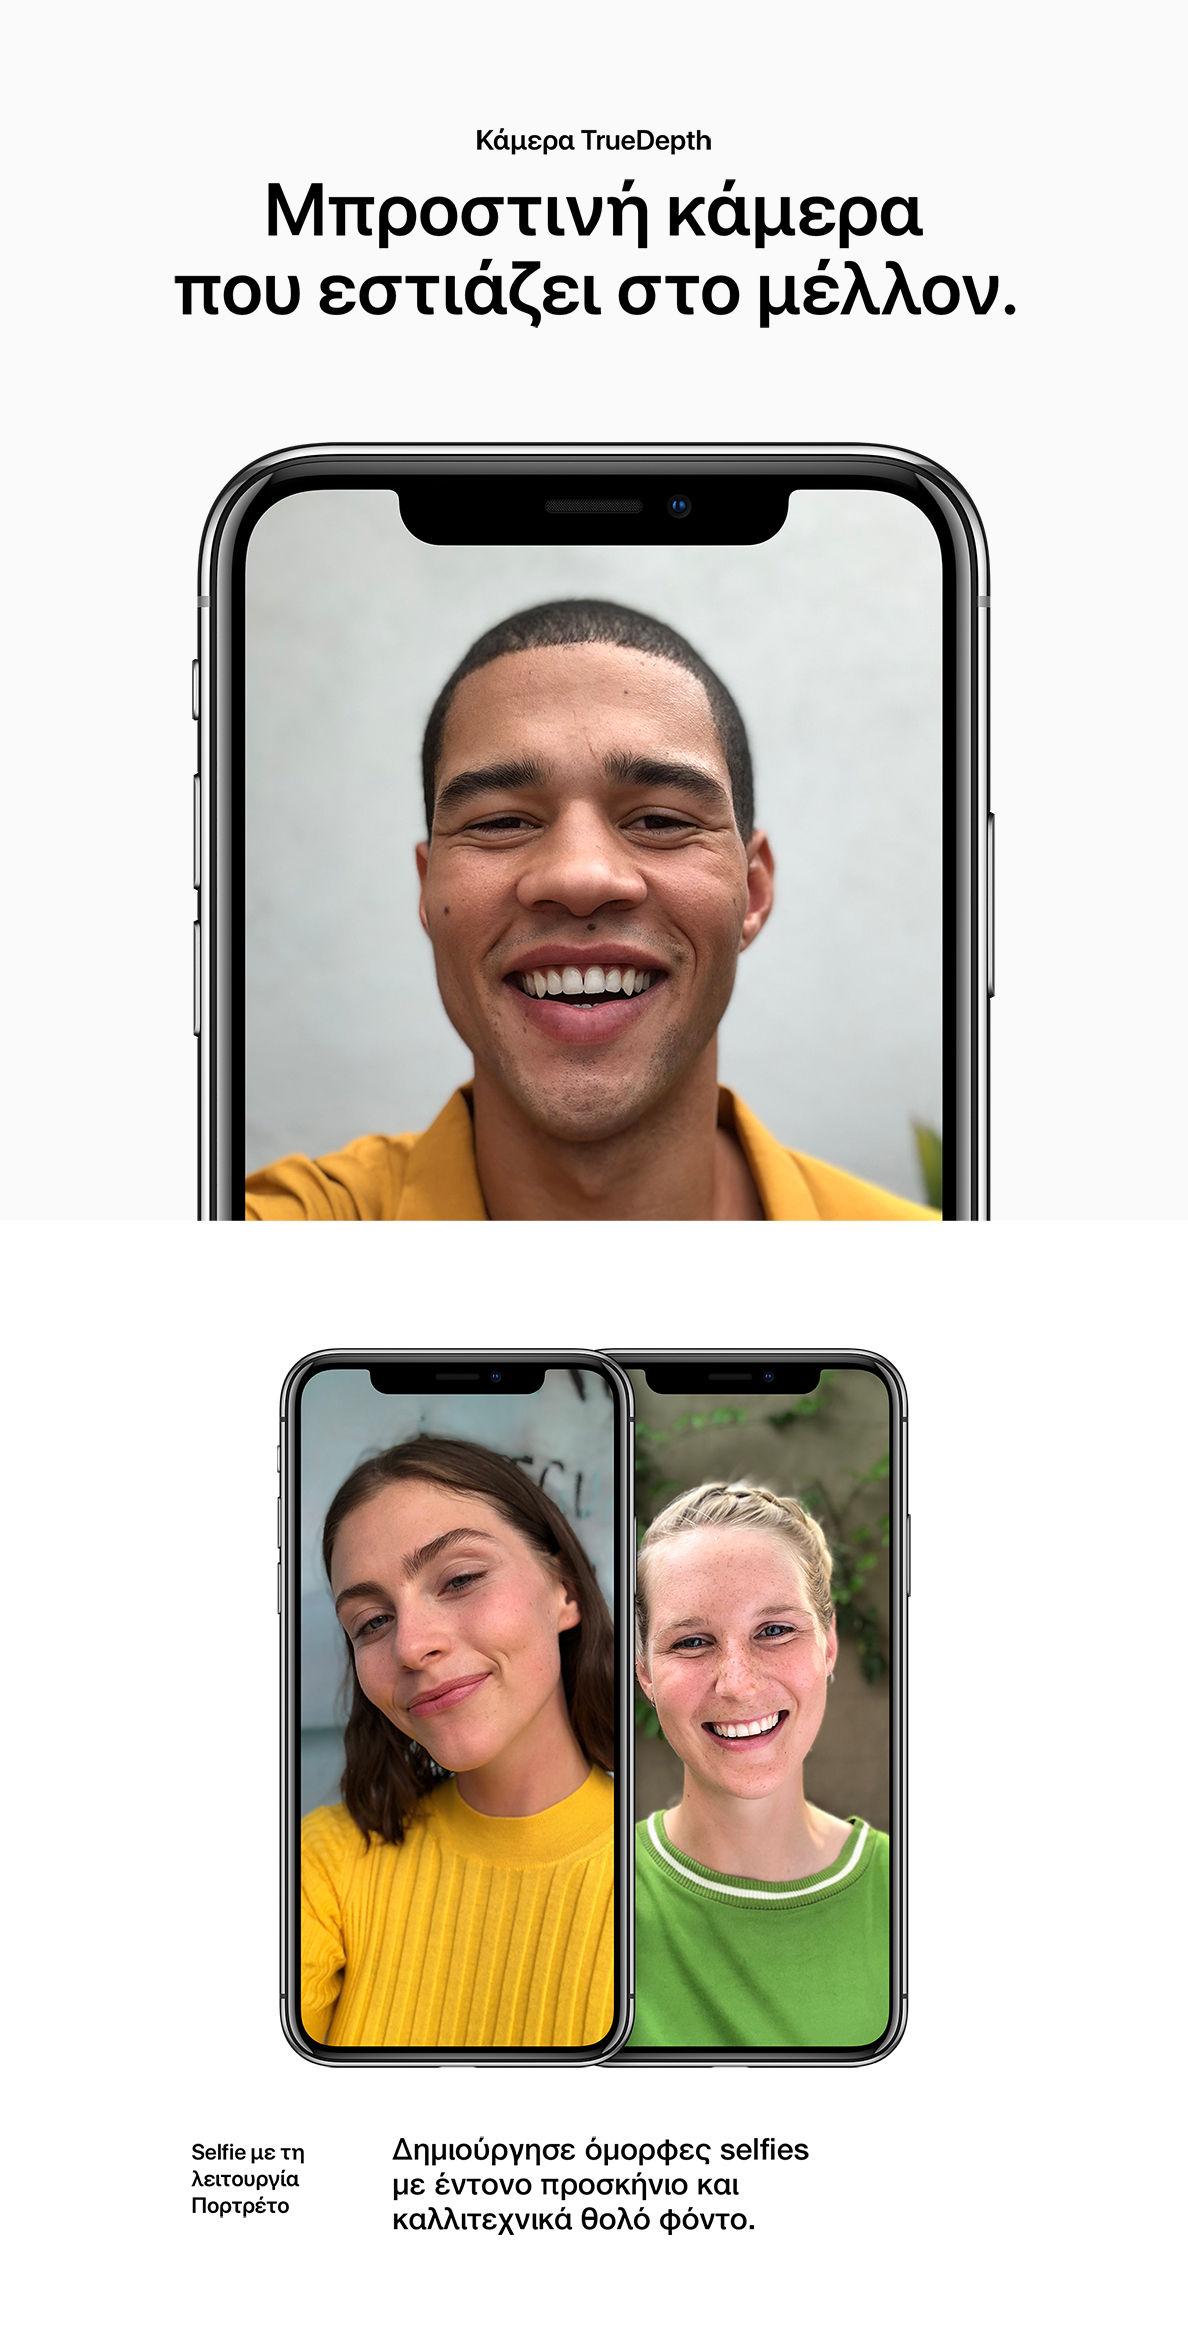 iPhonex-agora-Ellada-Mediamarkt-public-kotsovolos-germanos-iPhoneX-diathesimo-gia-paraggelia-november-2017 (7)